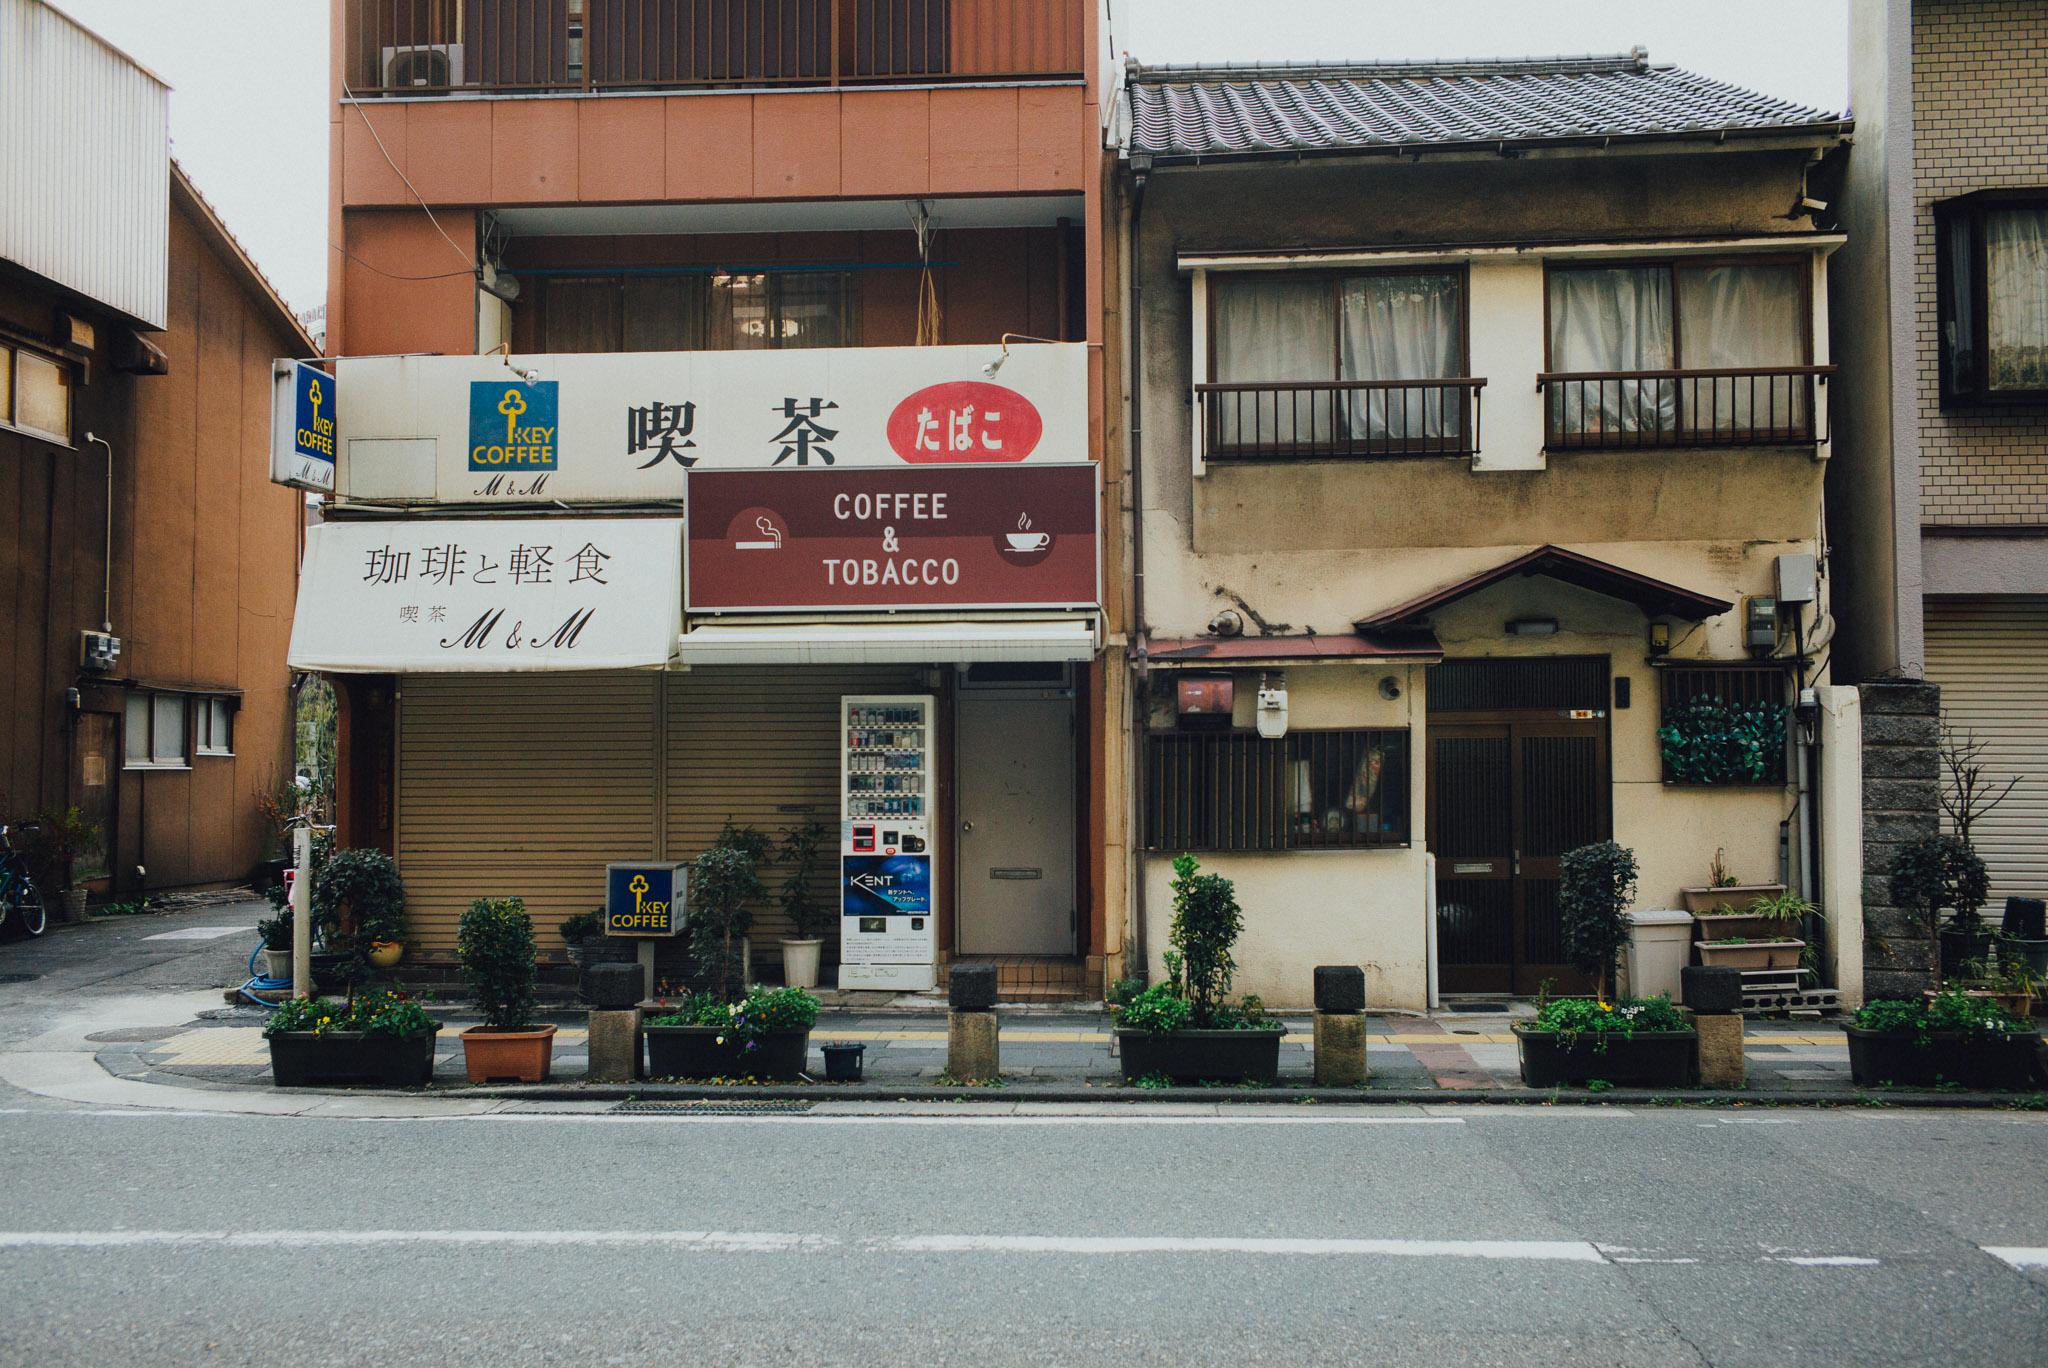 leica-mp-240-photographer-fukuoka-tenjin-shop-front